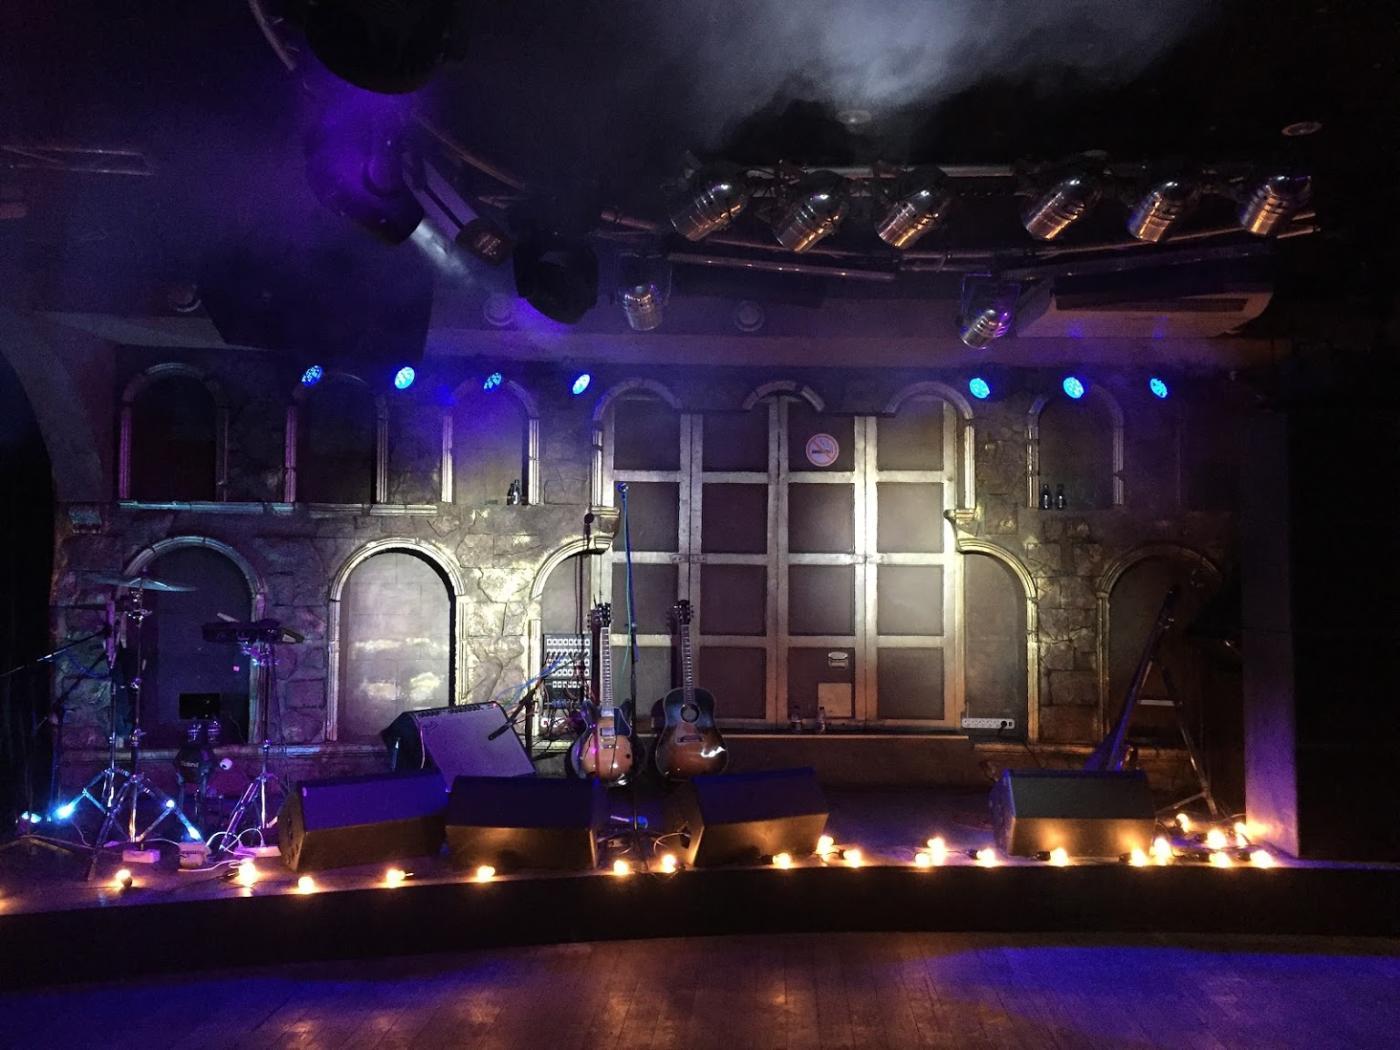 Караоке Концерт клуб (Koncert club) фото 13